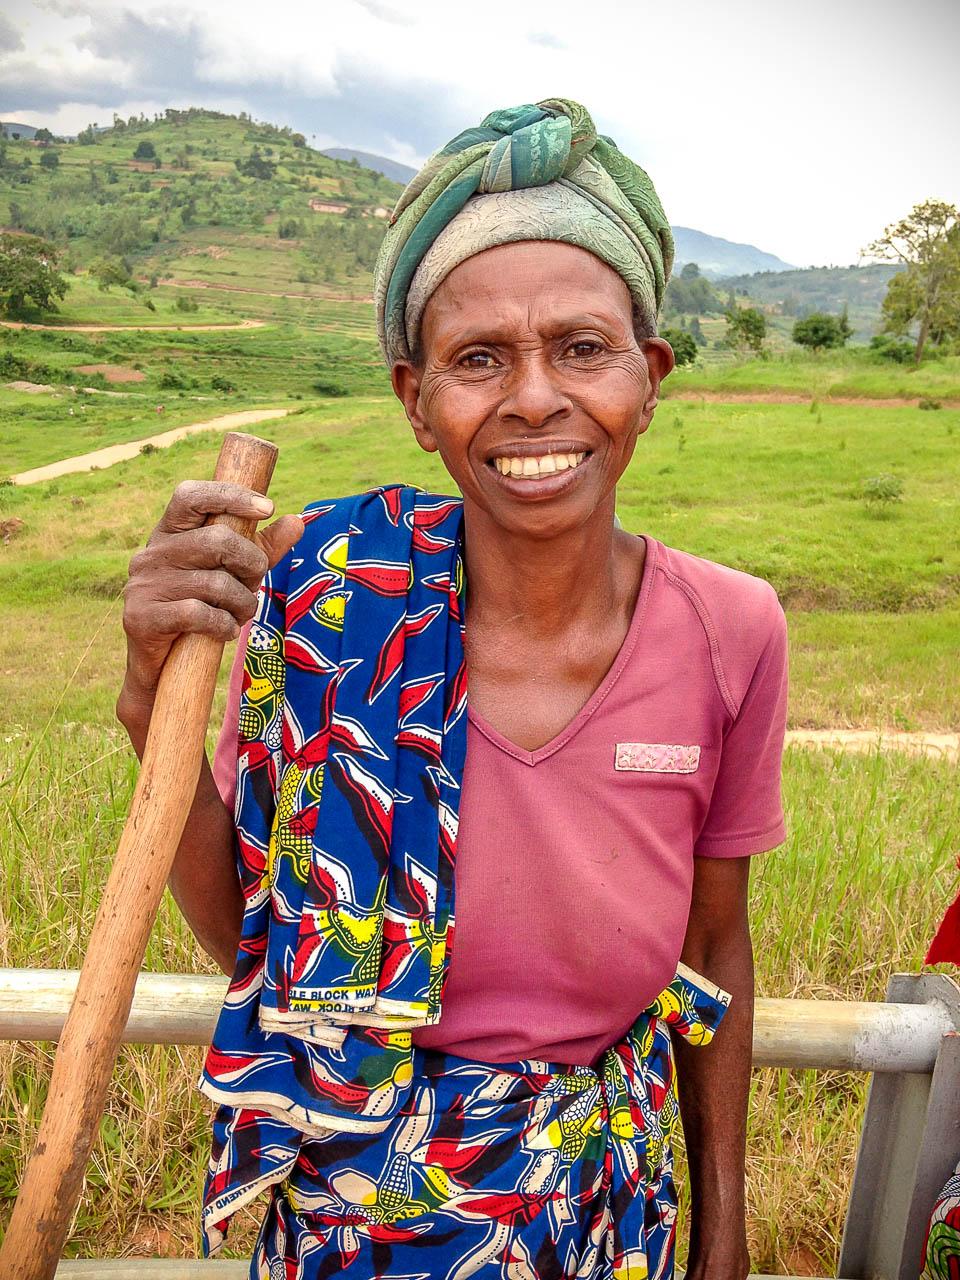 HopeForTomorrowGlobal - For bottom of Rwanda page so can be portrait IMG_2579 - 960